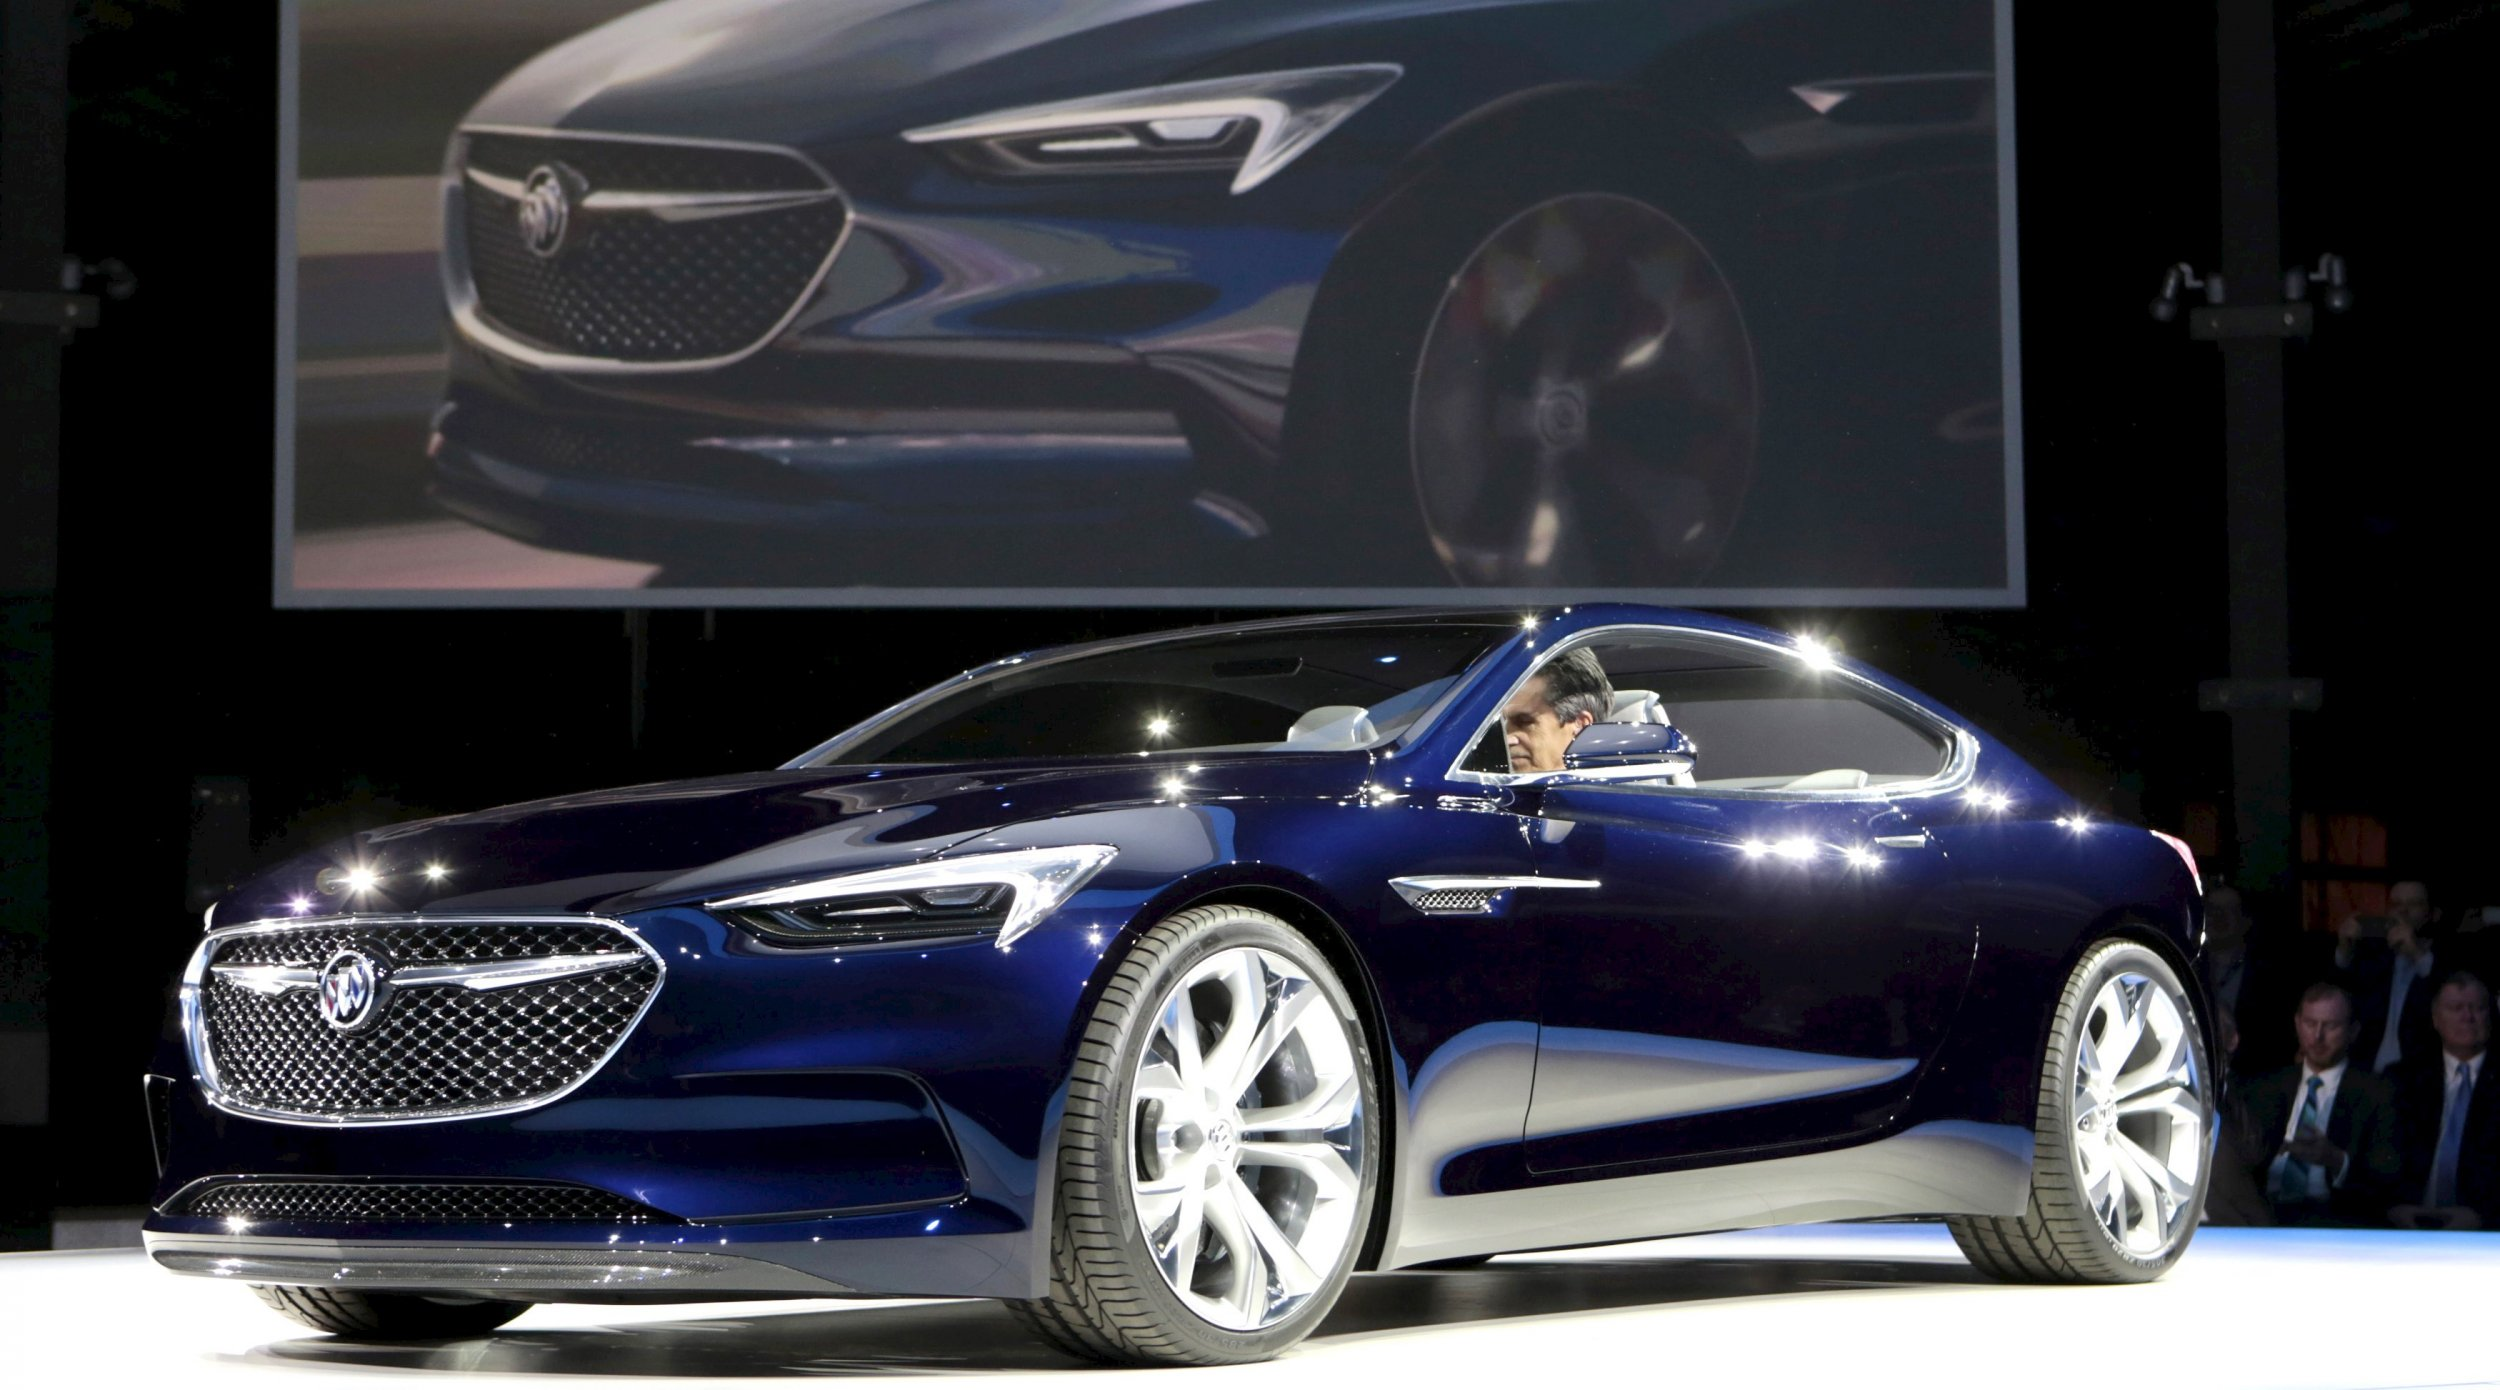 General Motors China sales go into reverse as market stalls